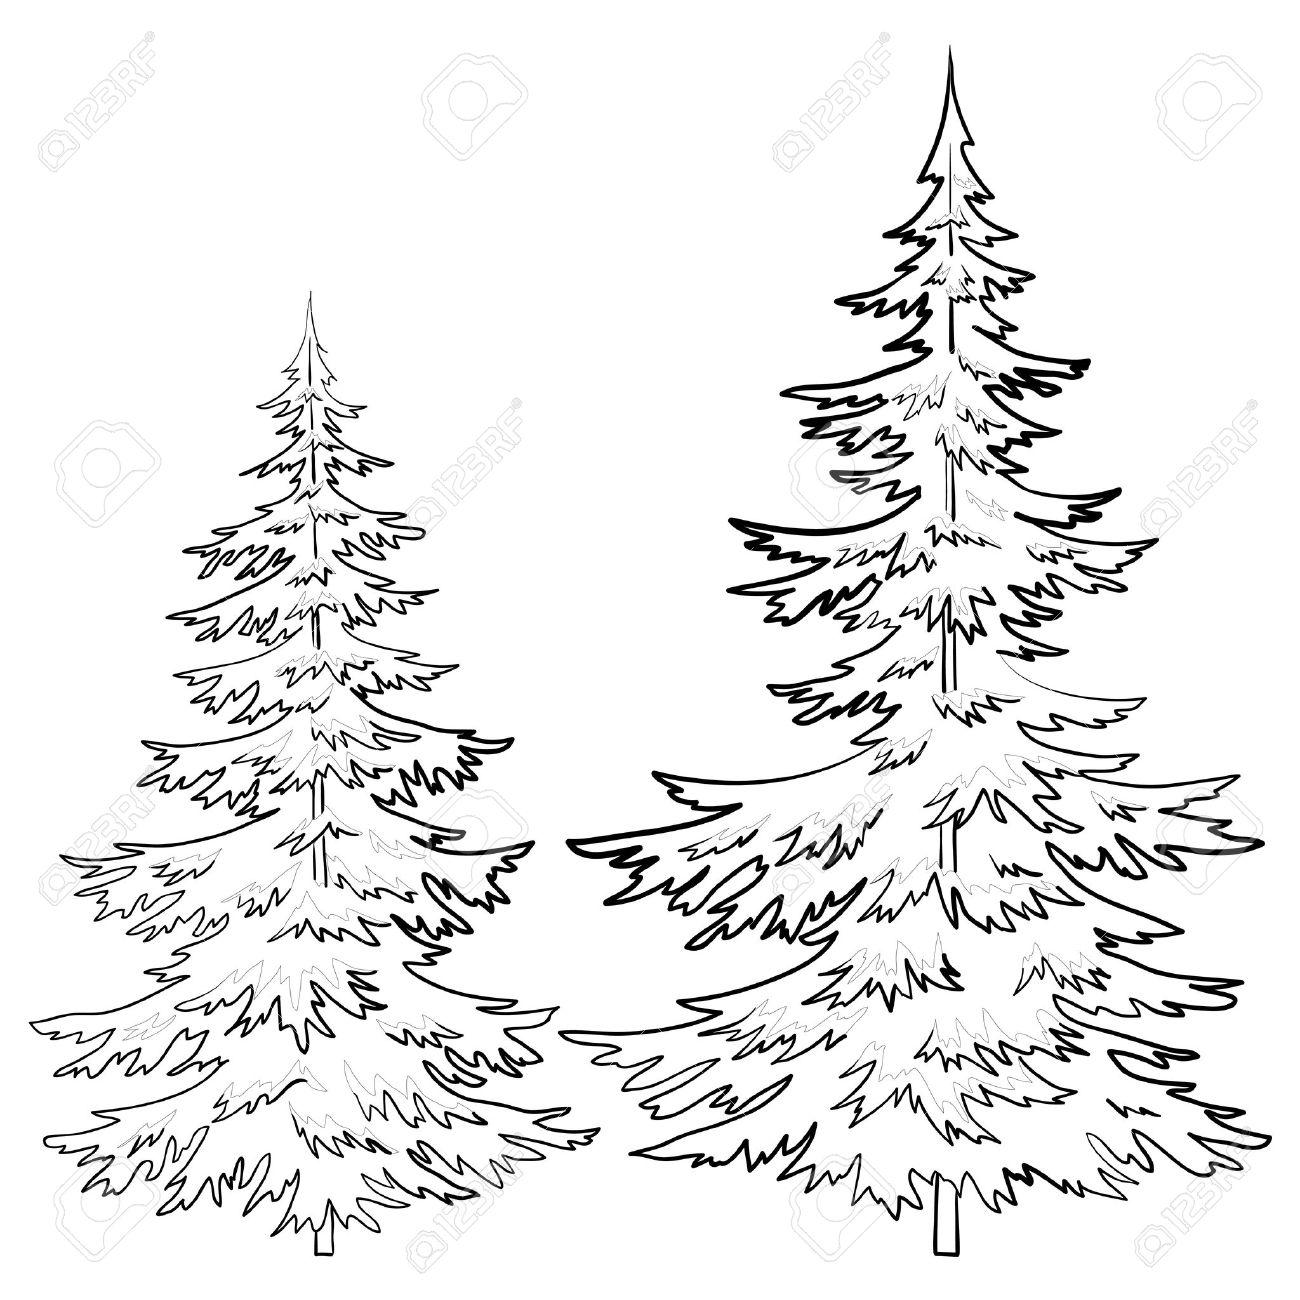 1300x1300 Trees, Fur Tree, Vector, Christmas Winter Symbol, Isolated